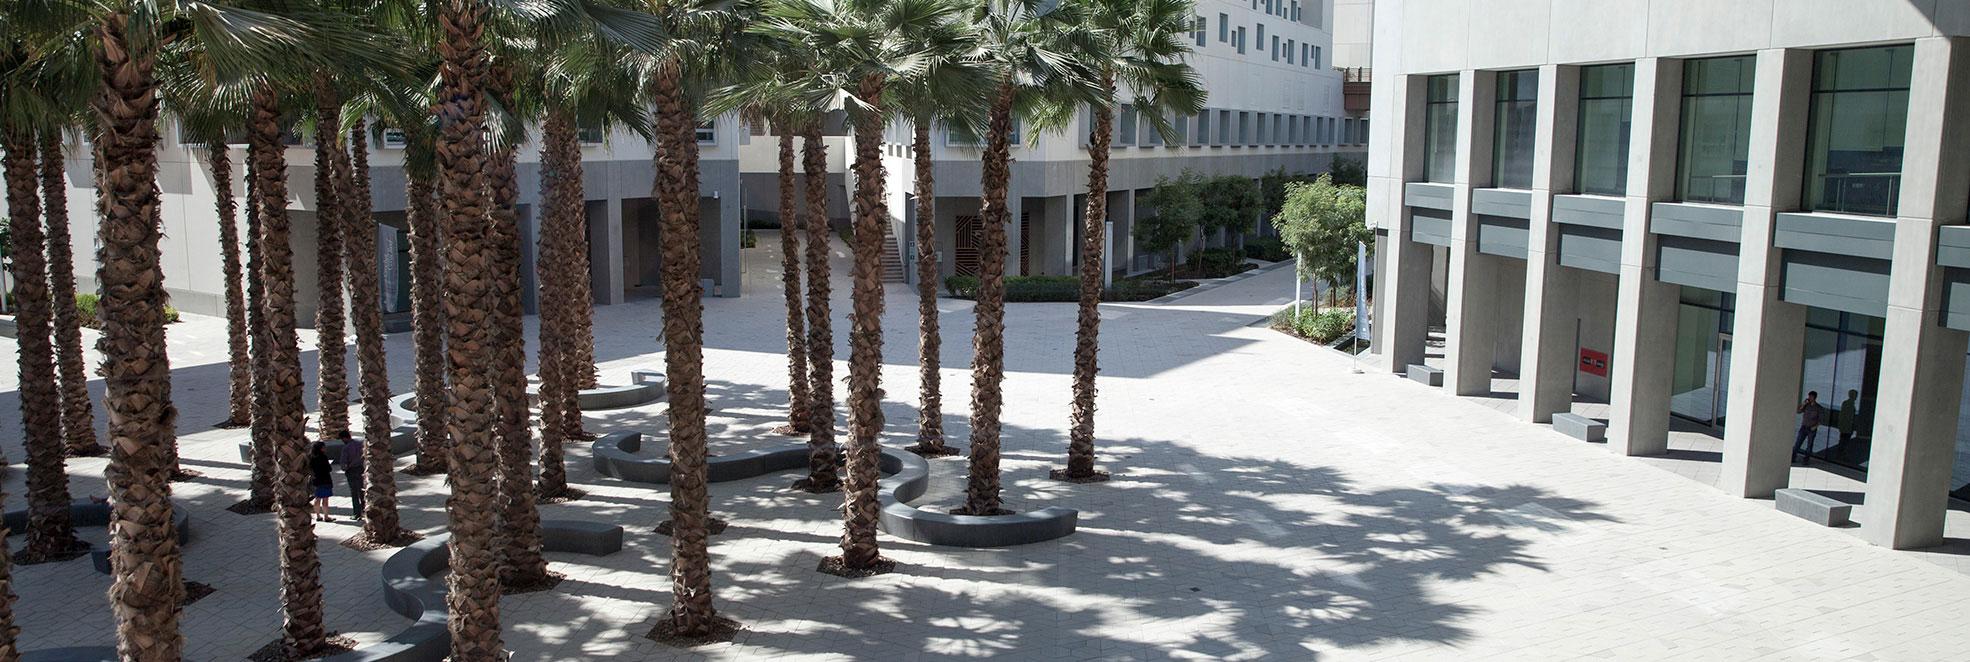 Registrar - NYU Abu Dhabi